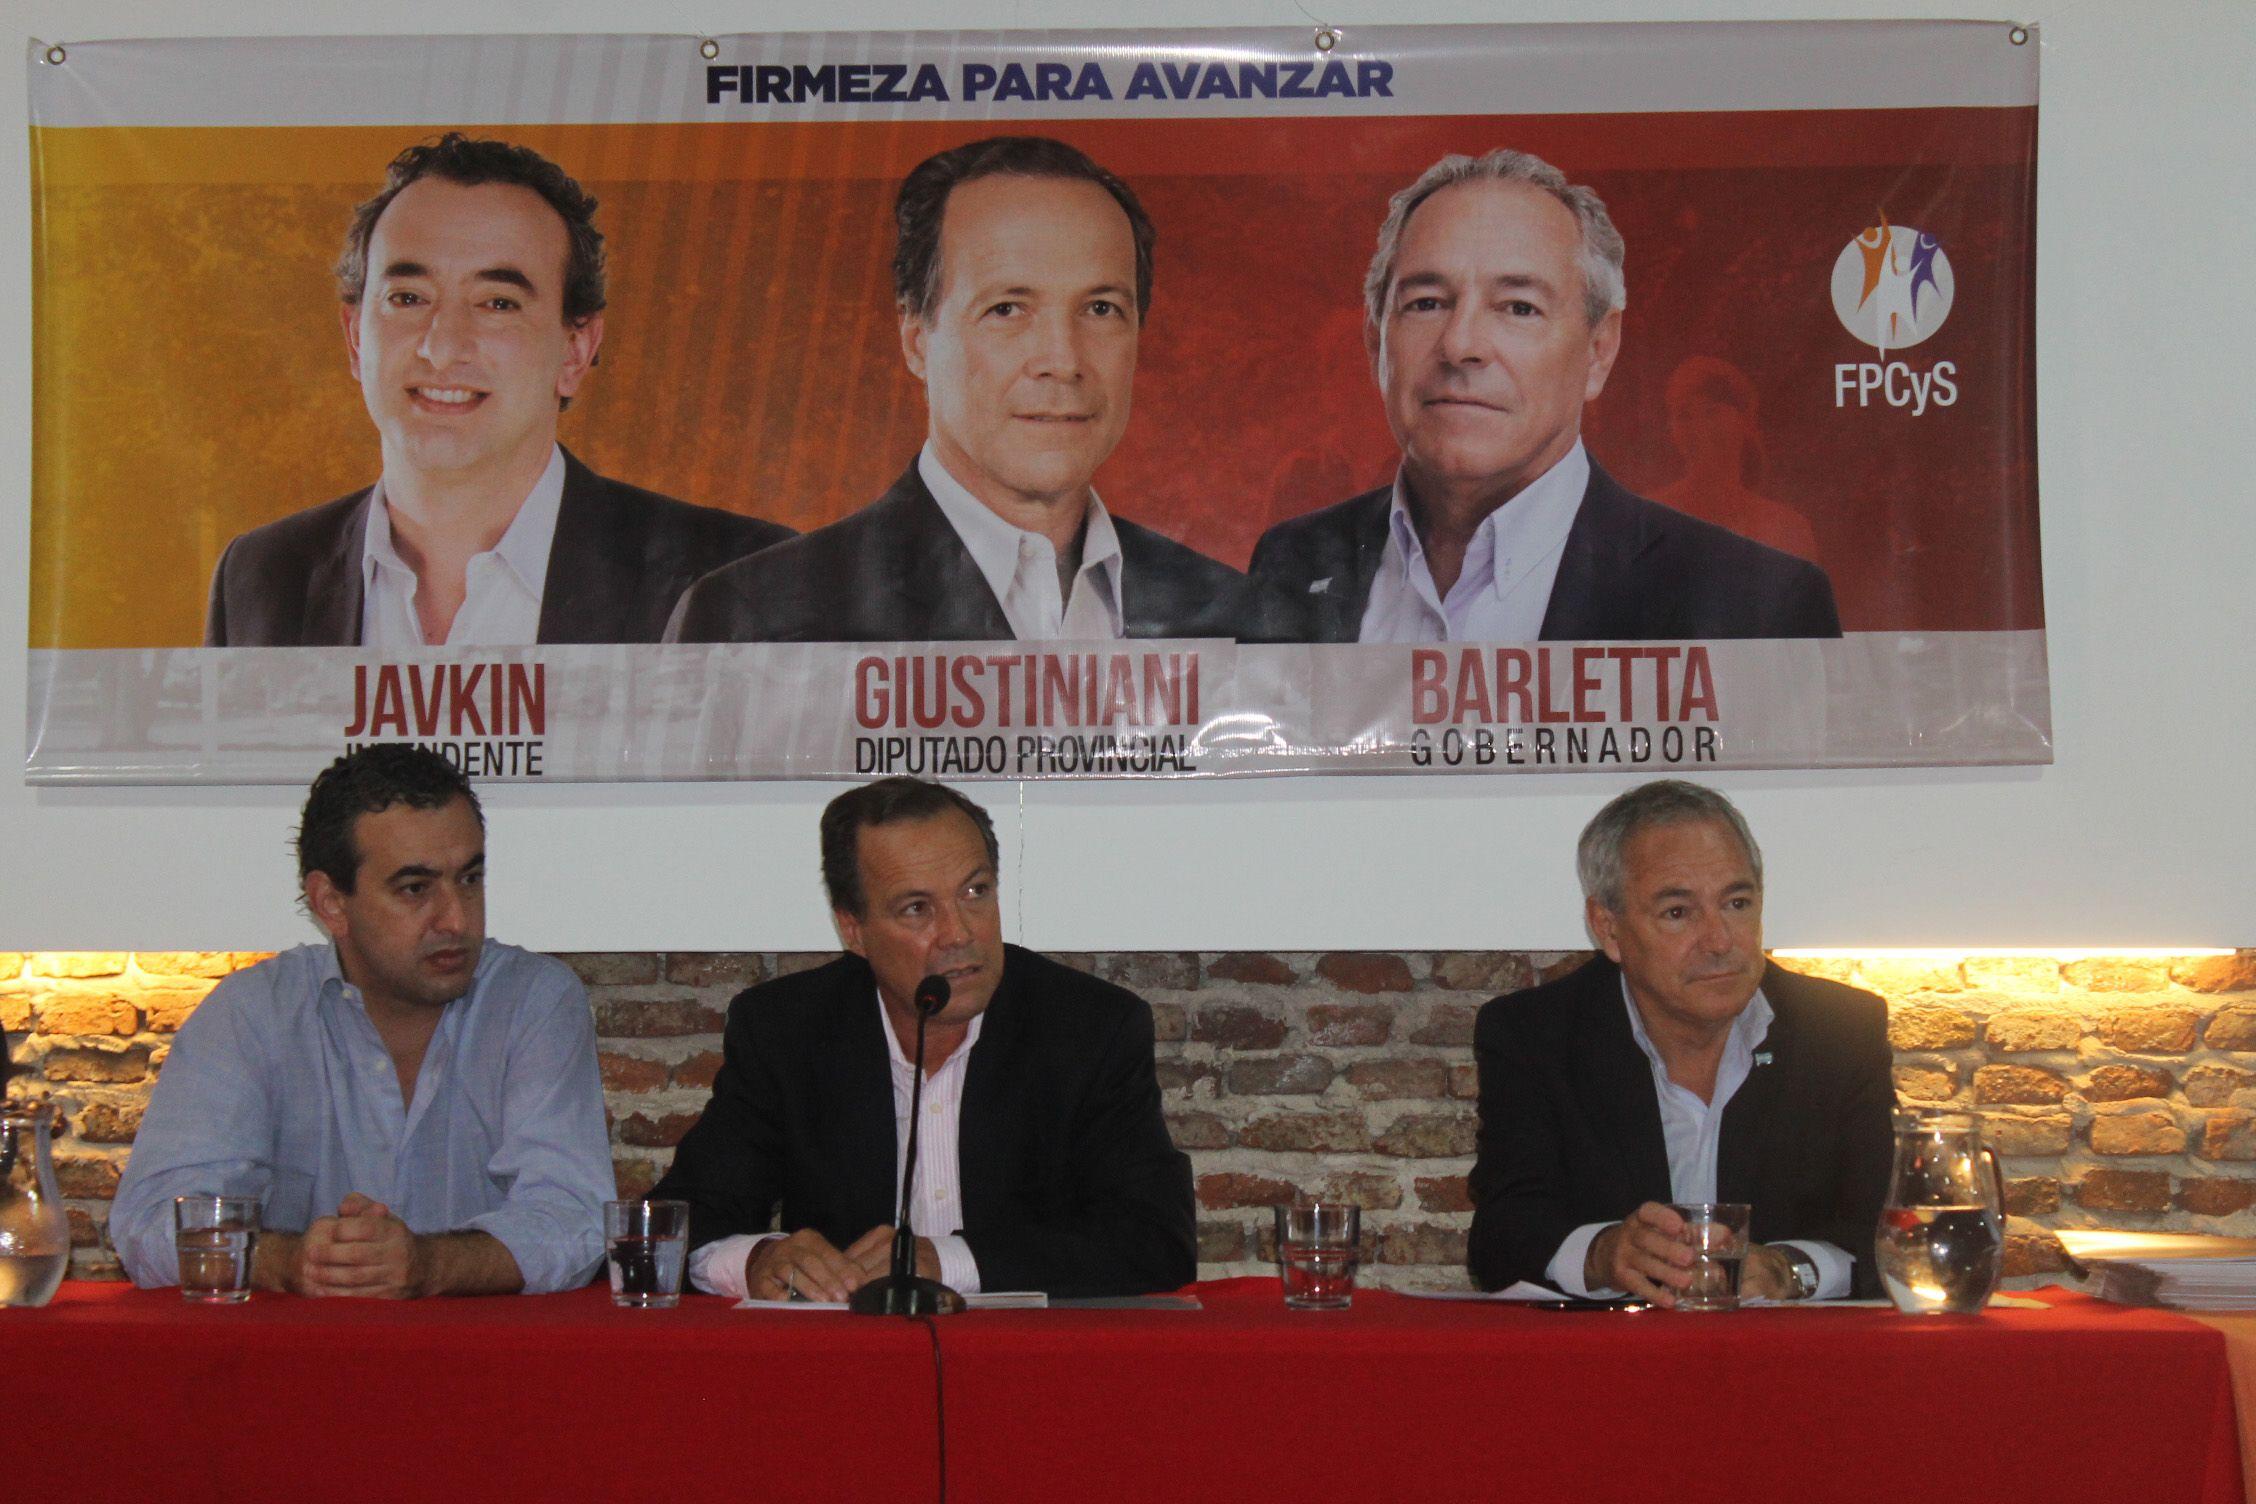 Giustiniani hizo pública su propuesta legislativa junto a Javkin y Barletta.